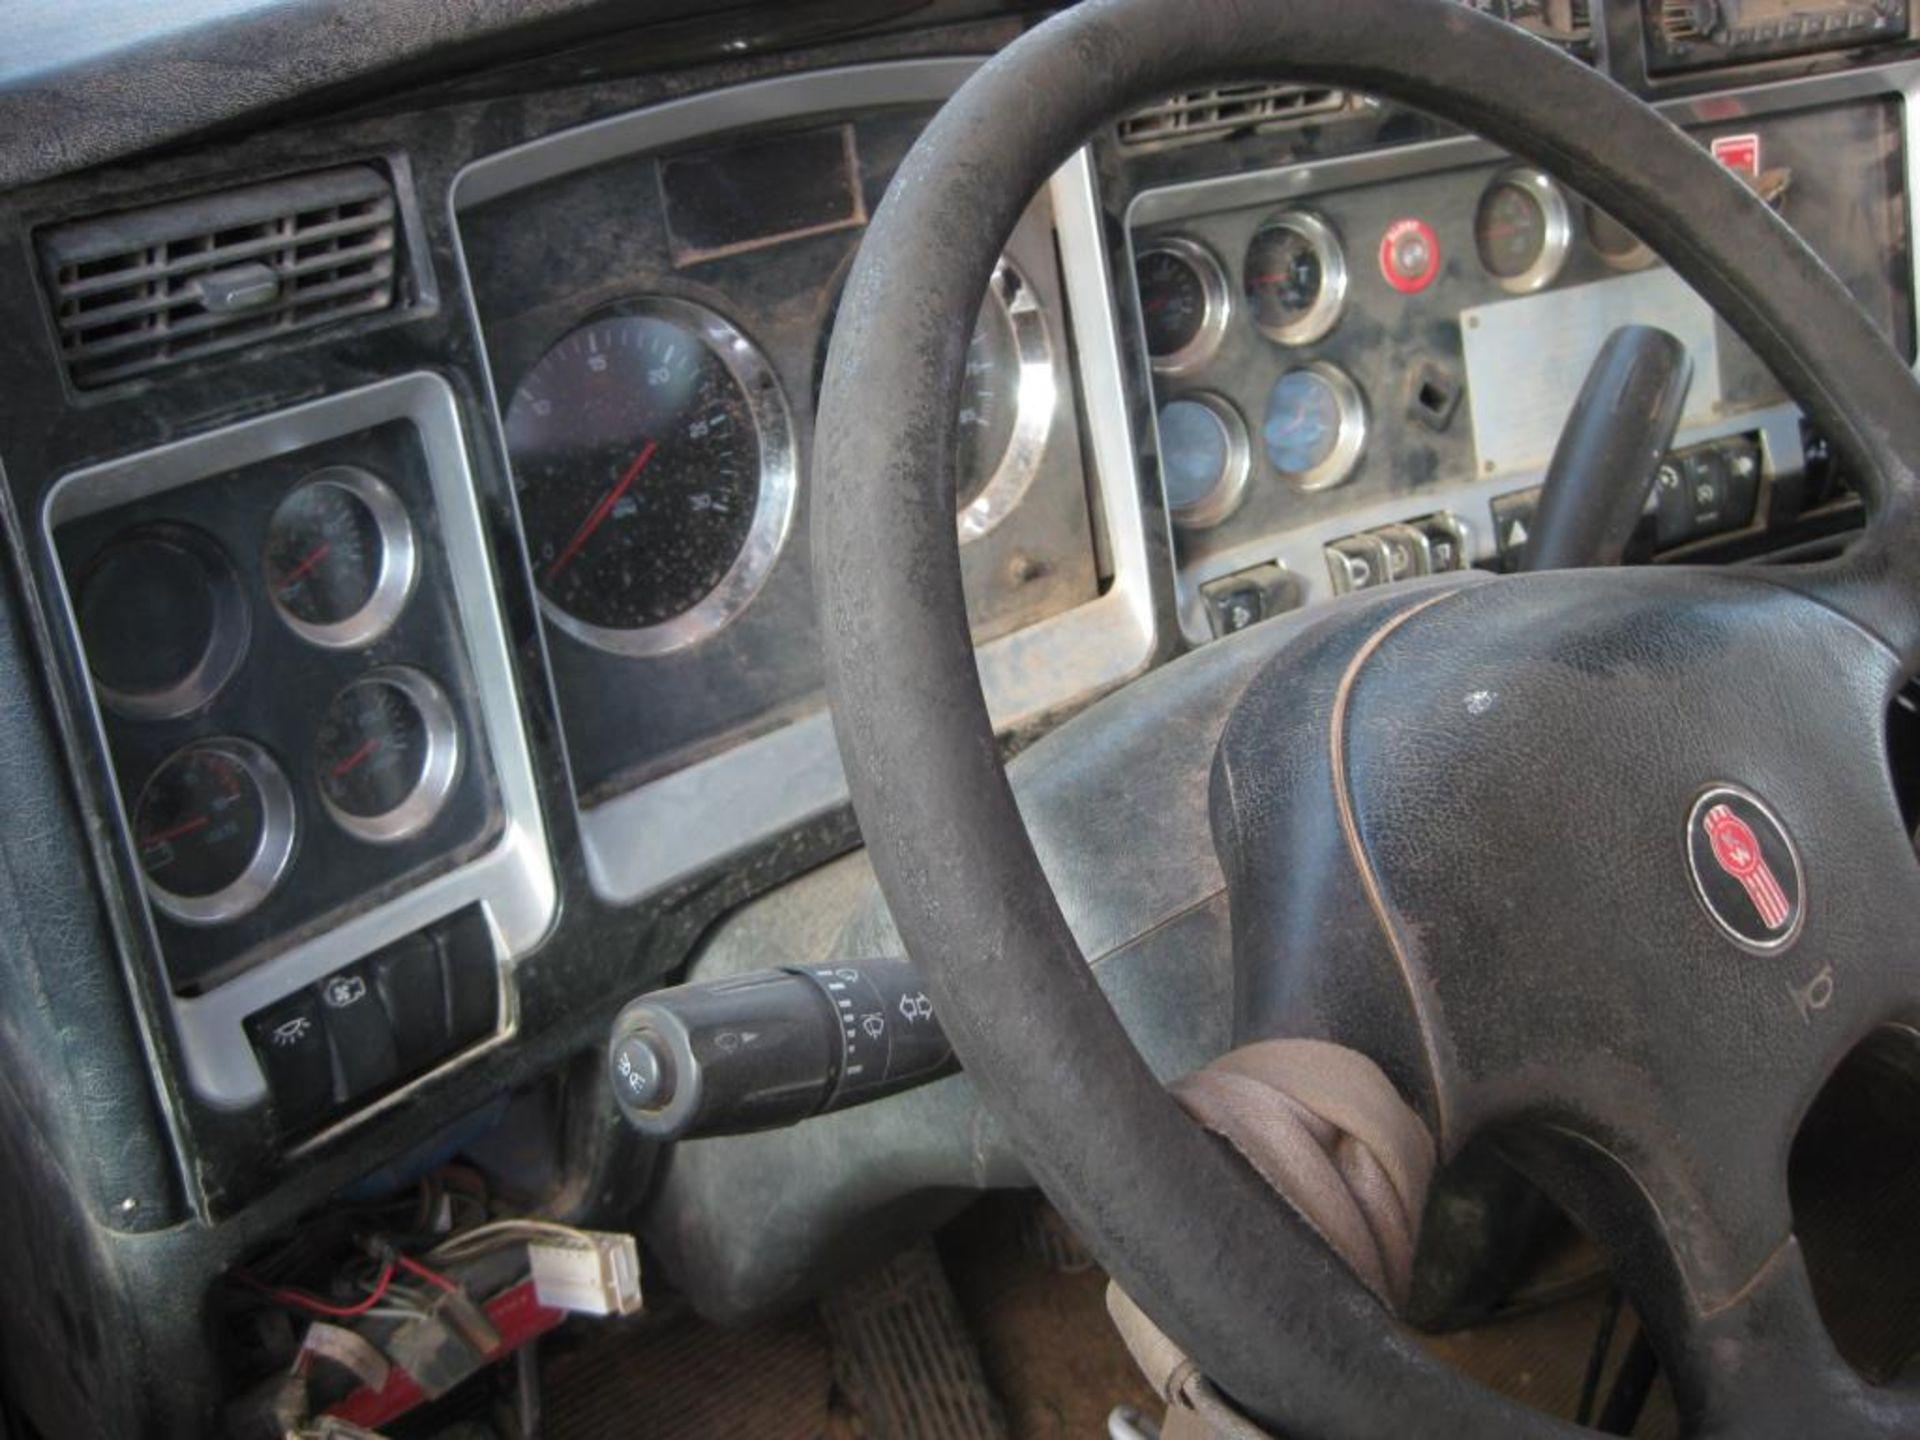 Kenworth Winch Truck - Image 18 of 22